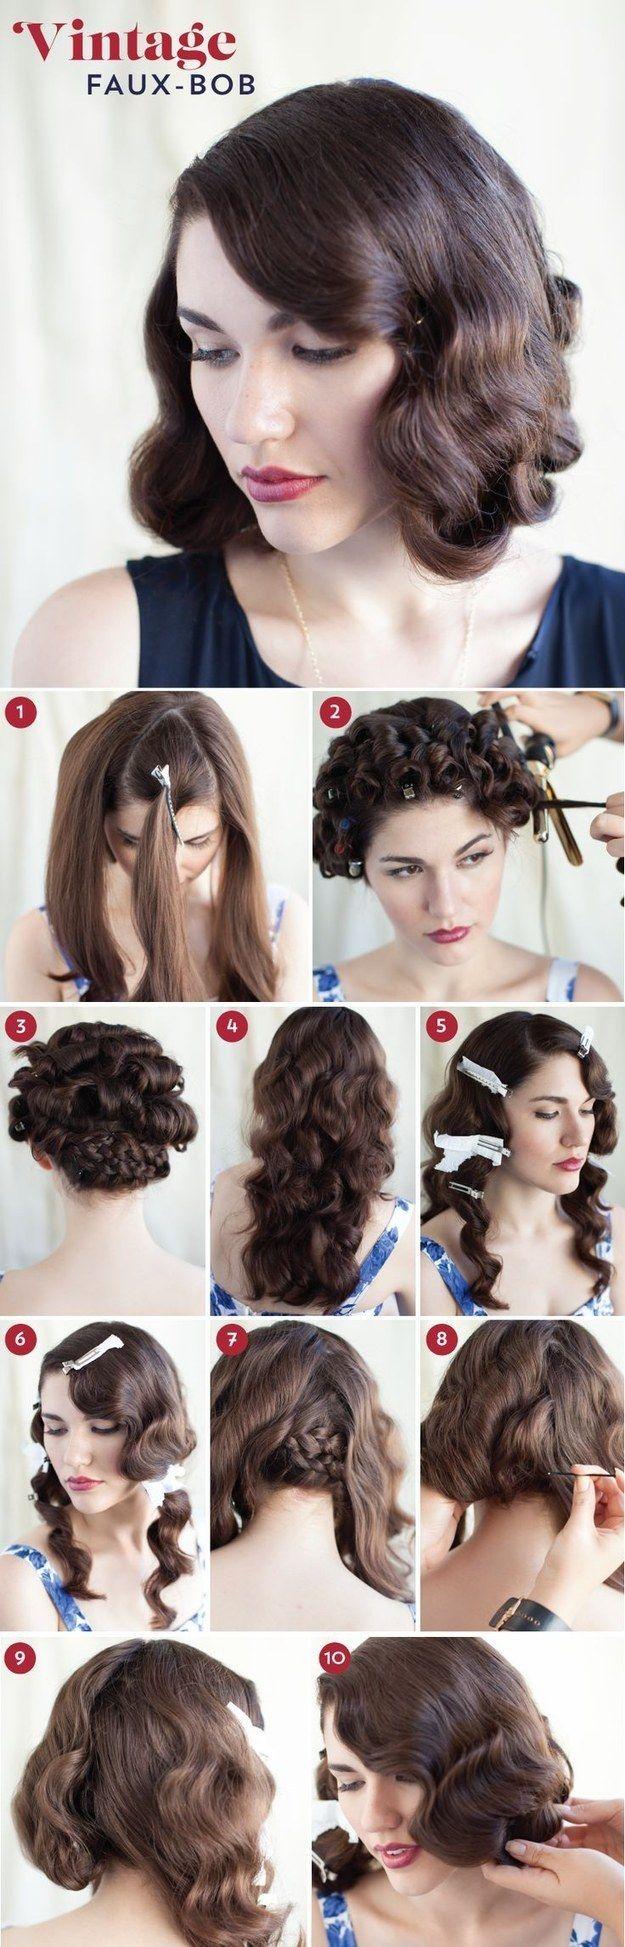 Incredible 1000 Ideas About Faux Bob Tutorial On Pinterest Gatsby Hair Short Hairstyles Gunalazisus